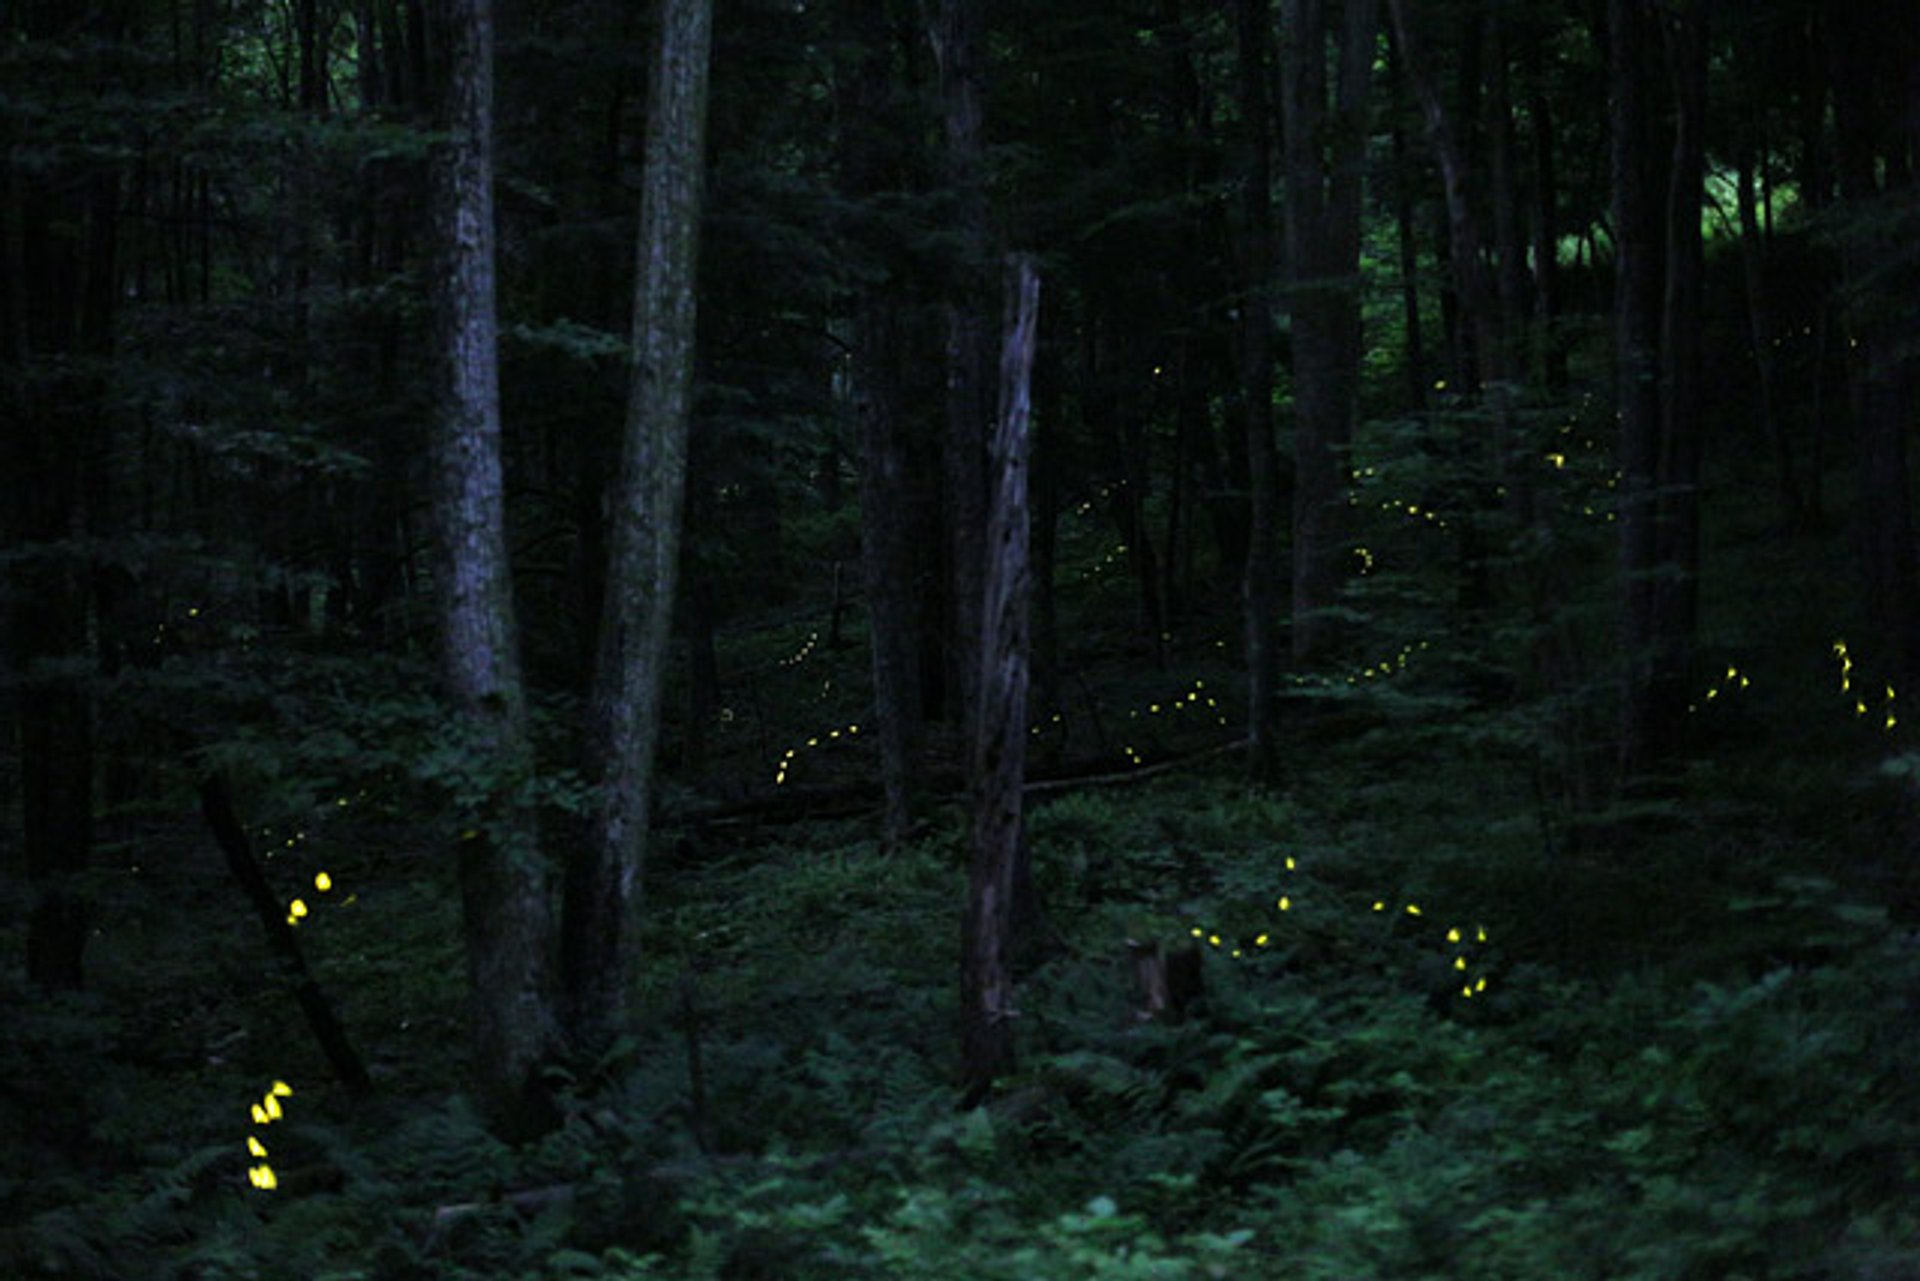 Synchronous Firefly Season in Pennsylvania 2020 - Best Time